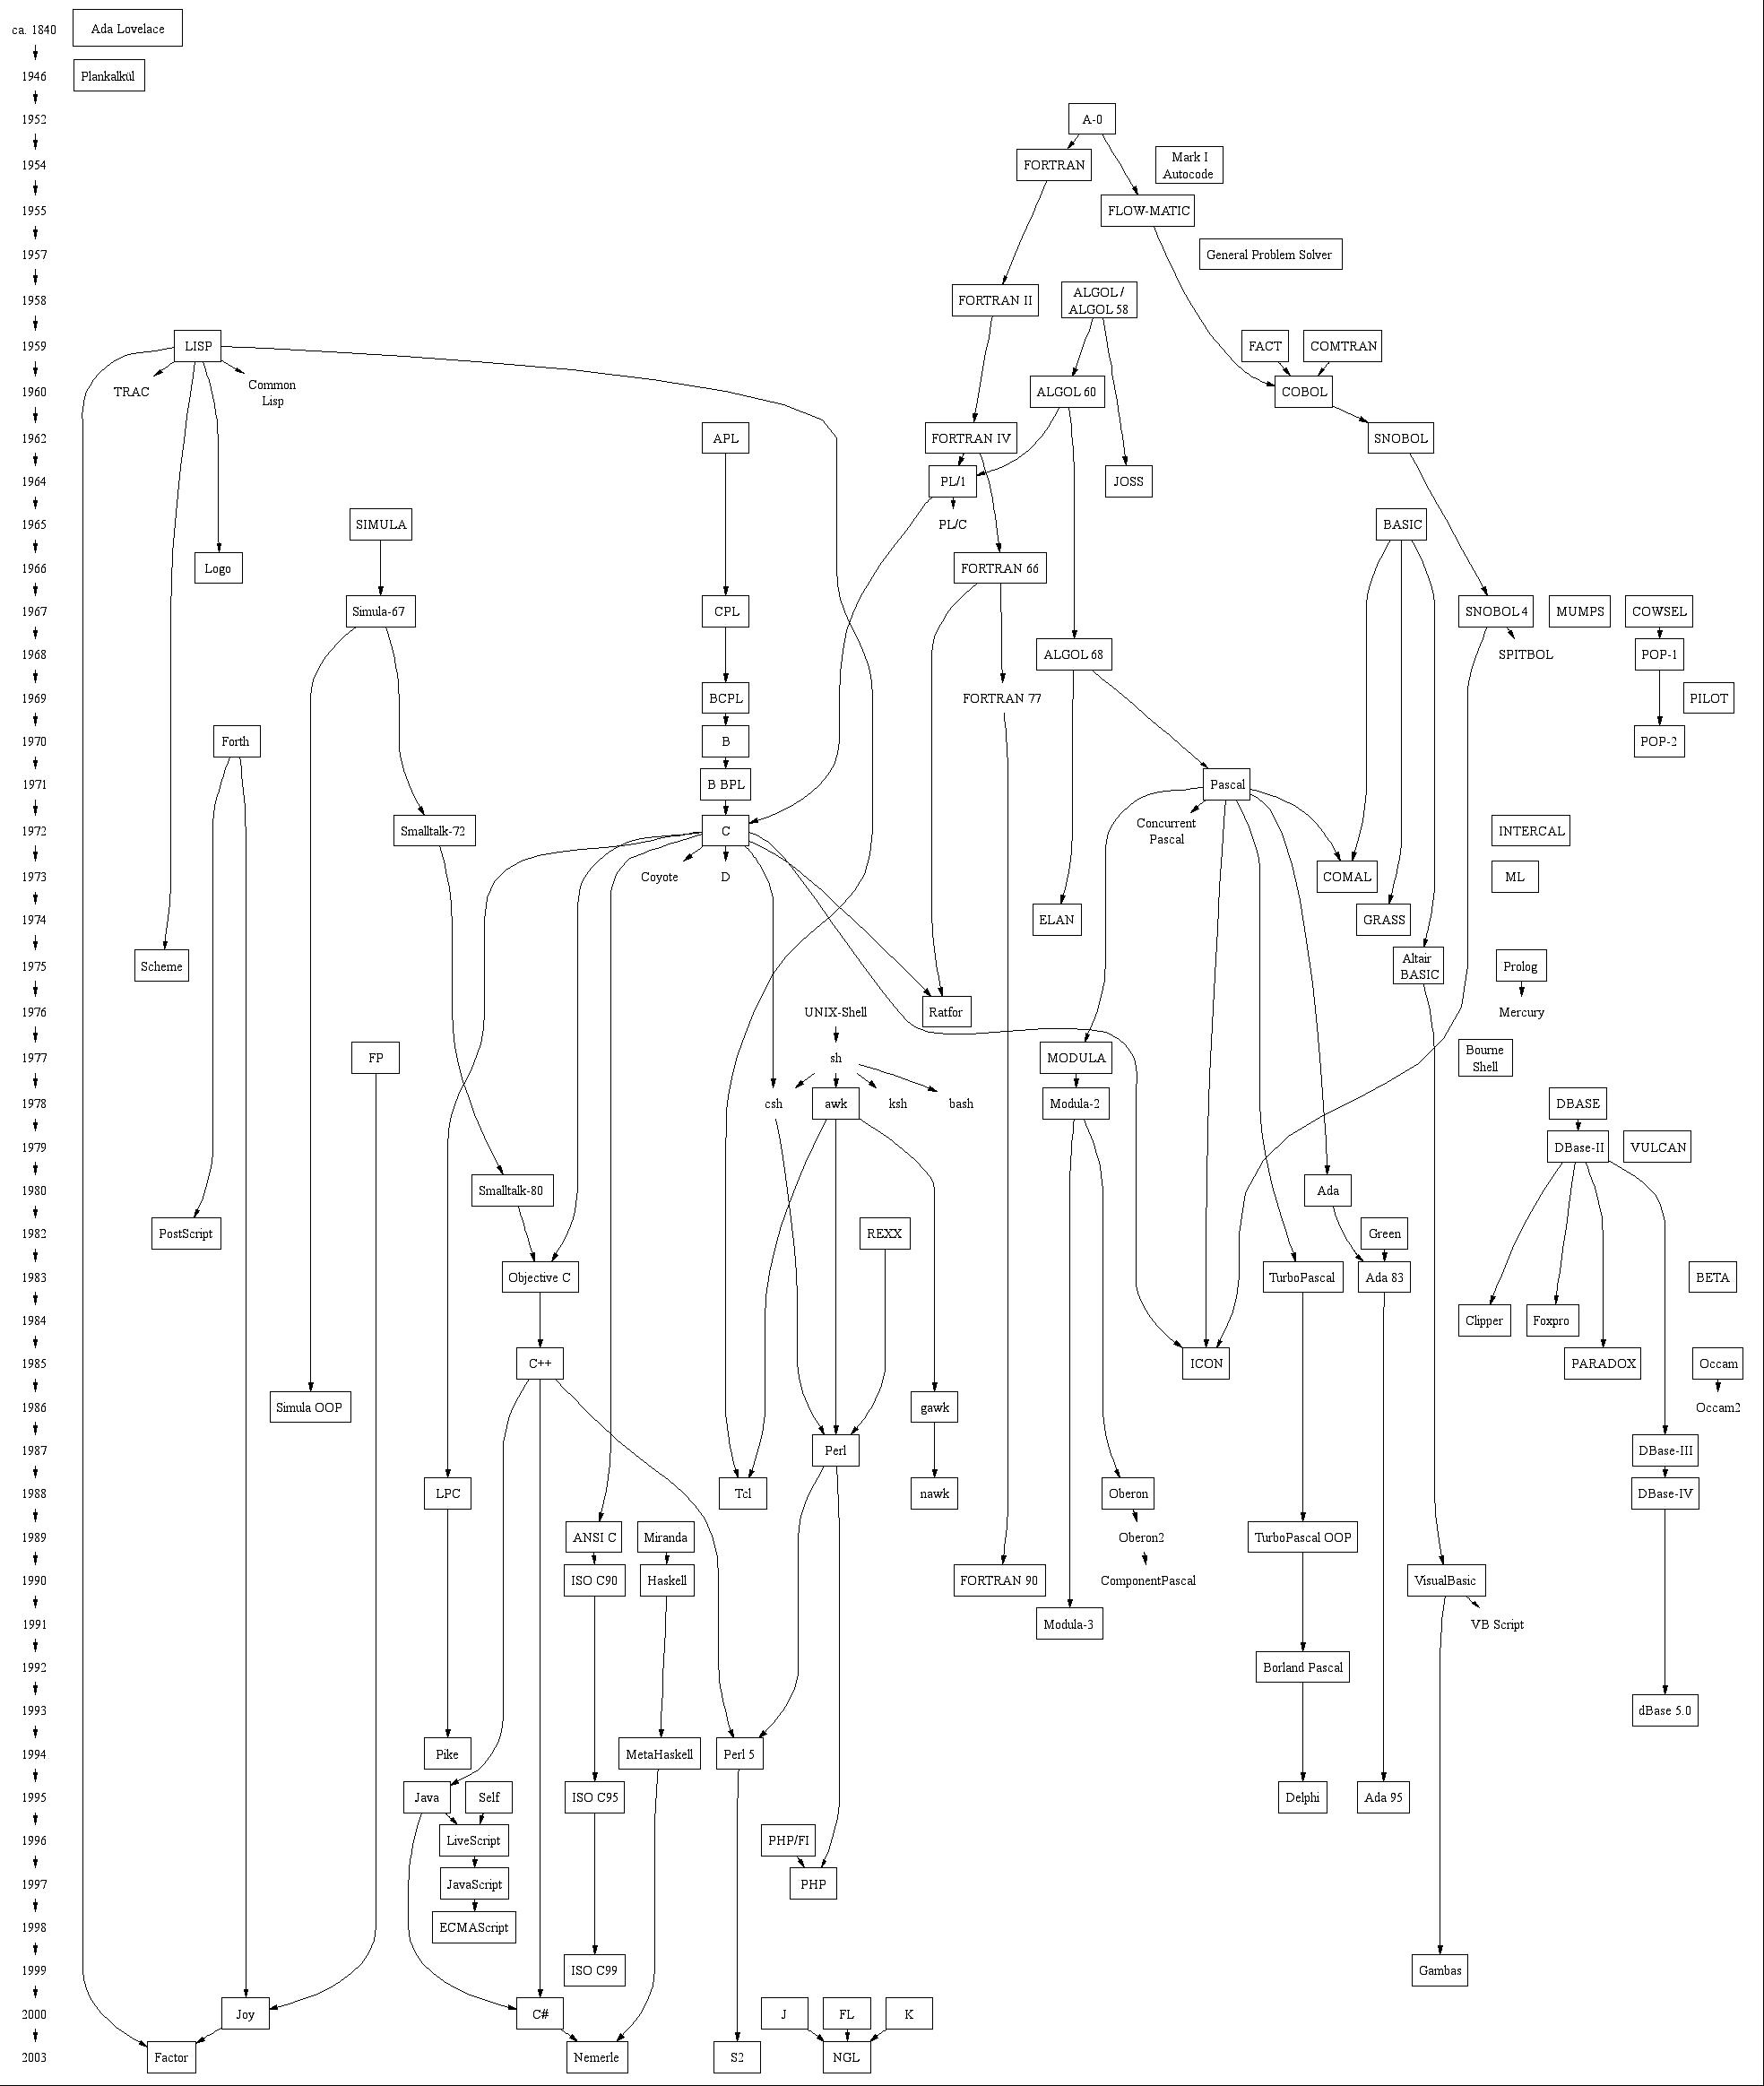 Scripting Languages Intro - Language chart of the world